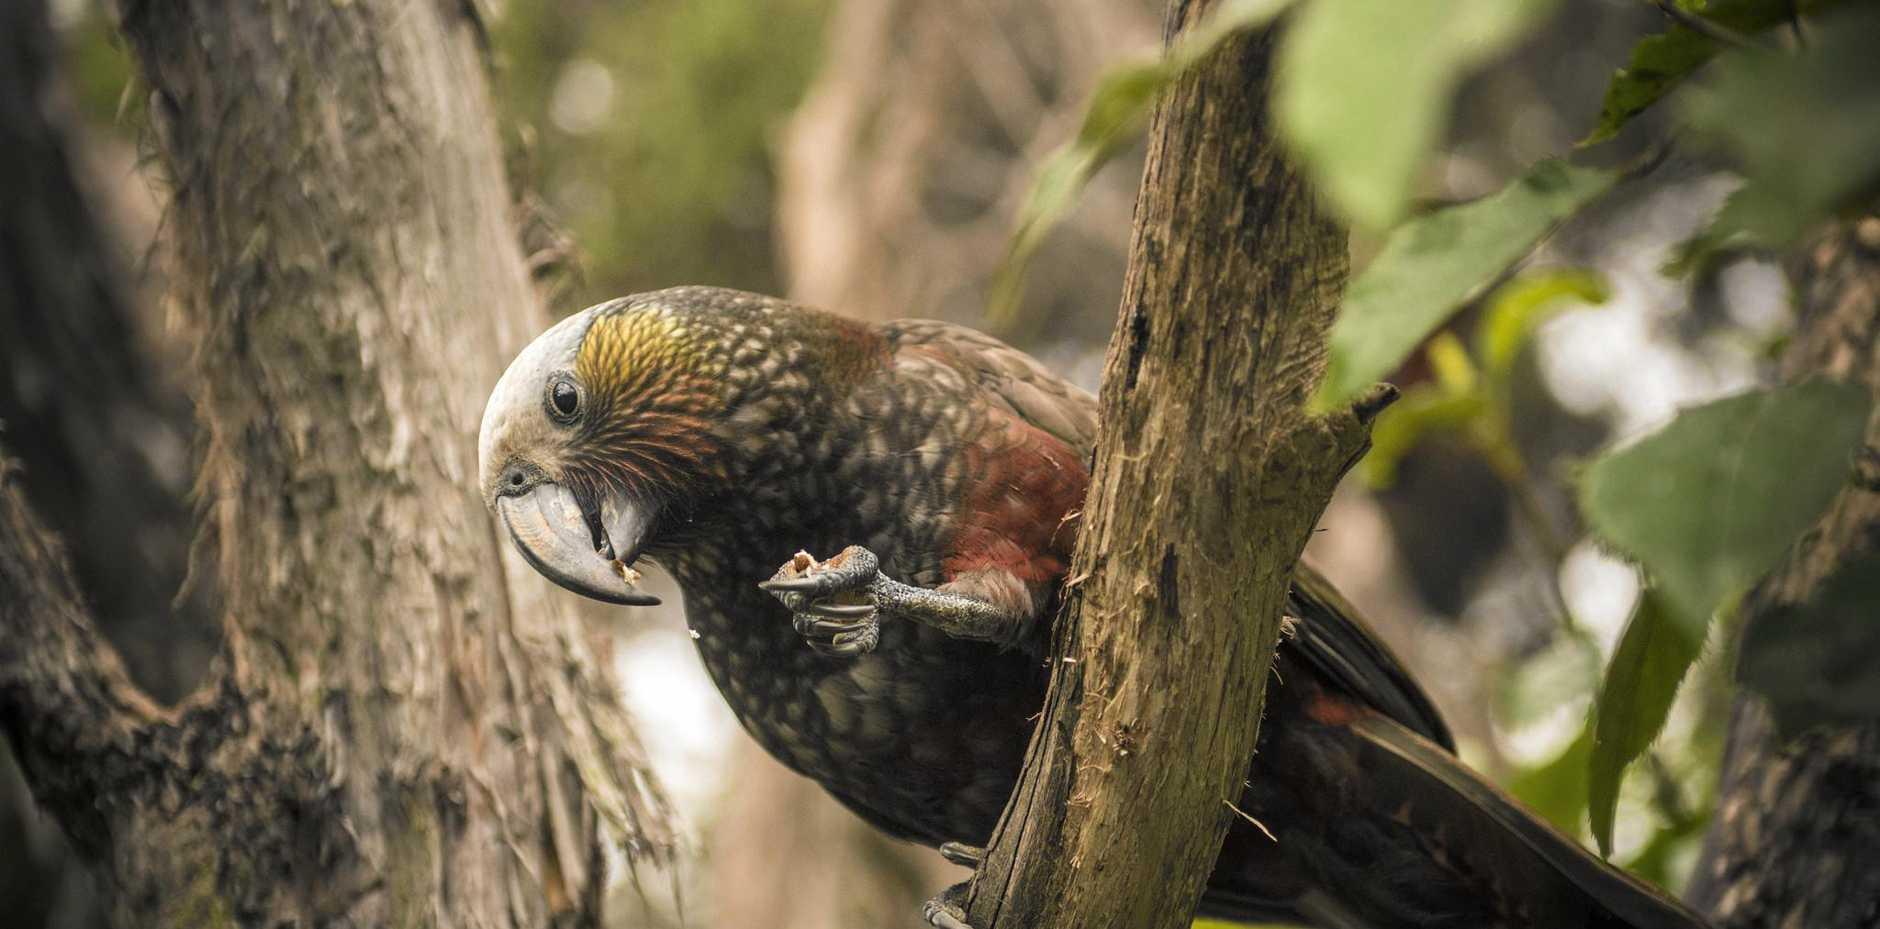 A kaka bird comes in for a feed at the Orokonui Eco Sanctuary near Dunedin.